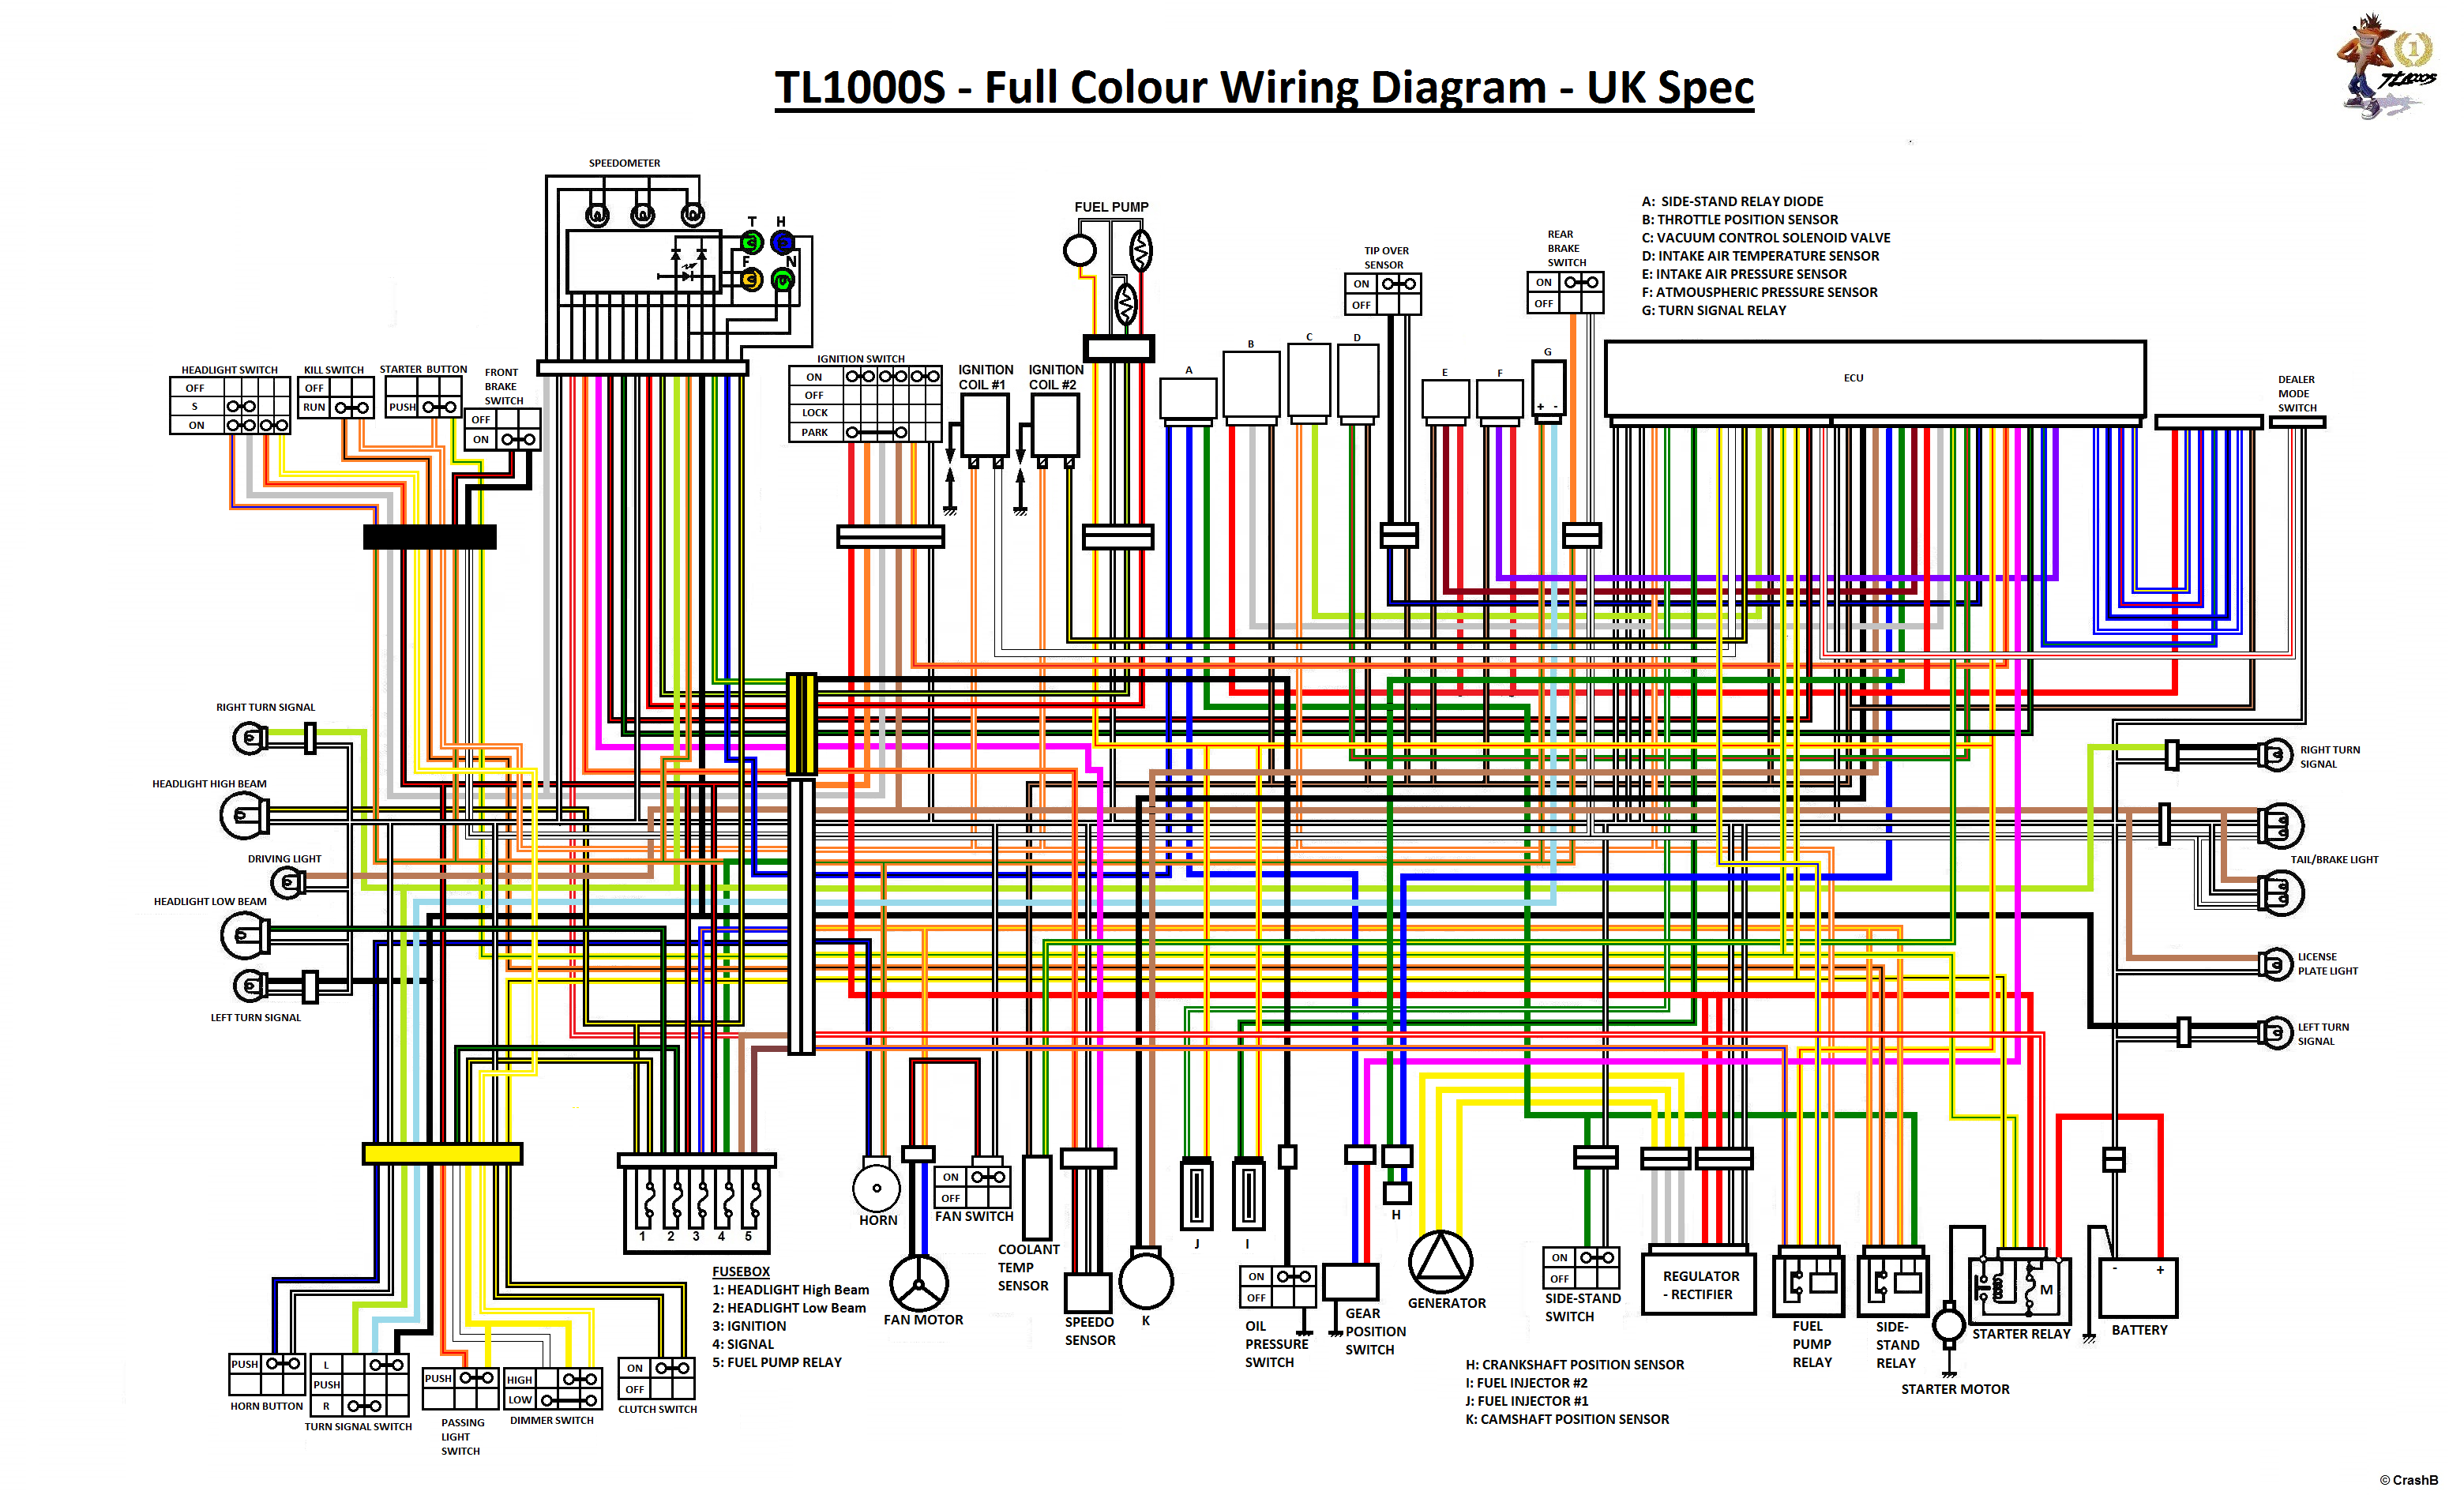 Suzuki Sv650 Electrical Diagram Best Wiring Diagrams Mind Table Mind Table Ekoegur Es